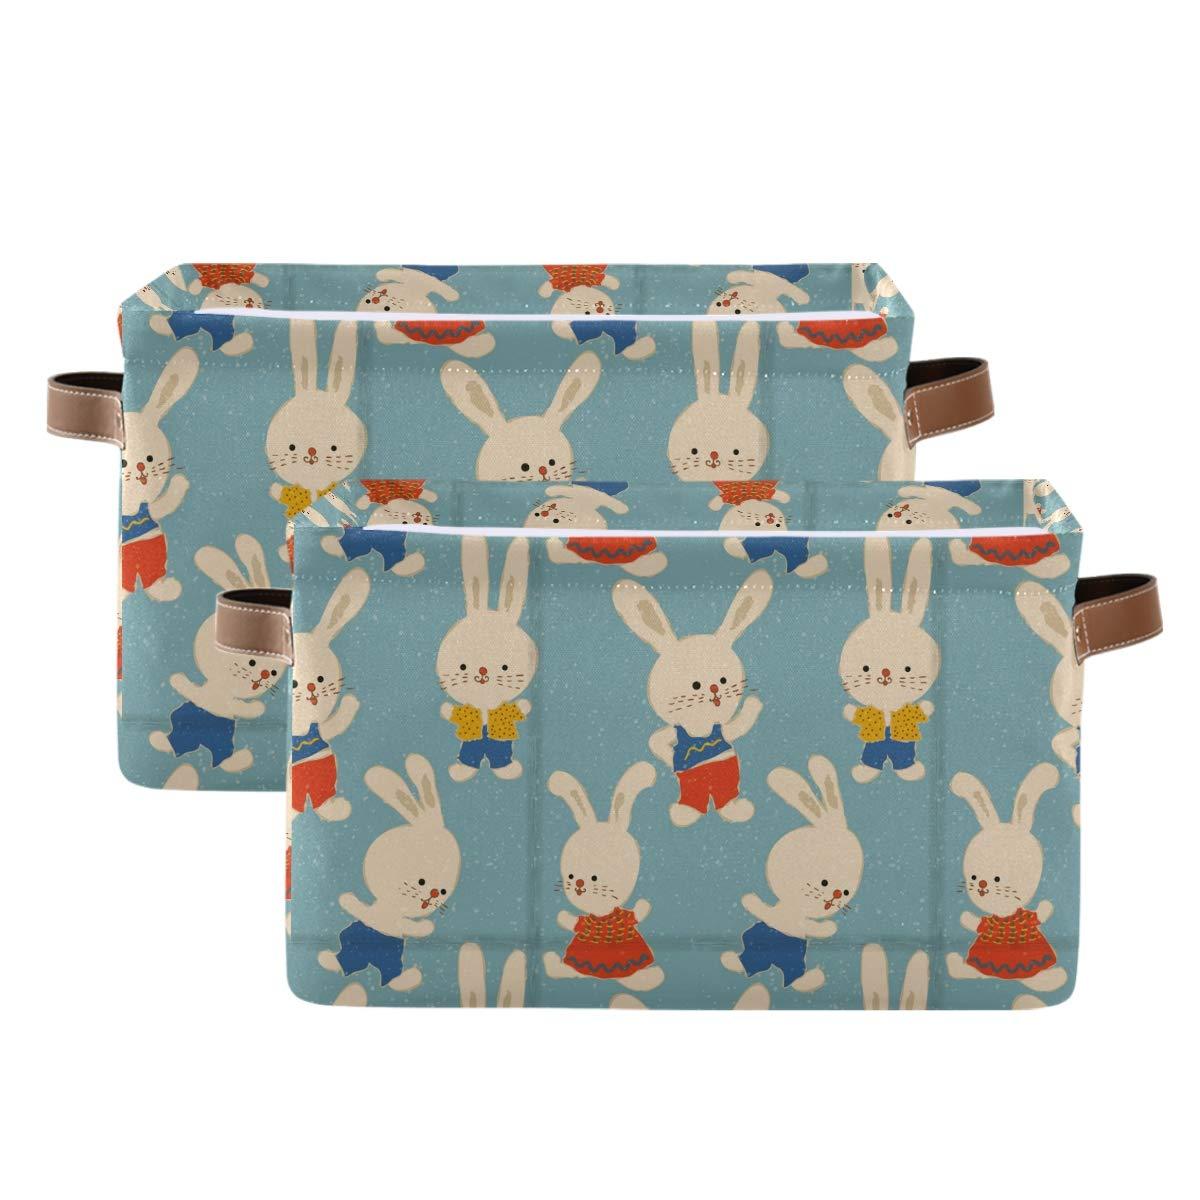 Kelekey Cartoon Nippon regular agency Cute Animal Rabbit Storage Large Oklahoma City Mall Basket Collapsi